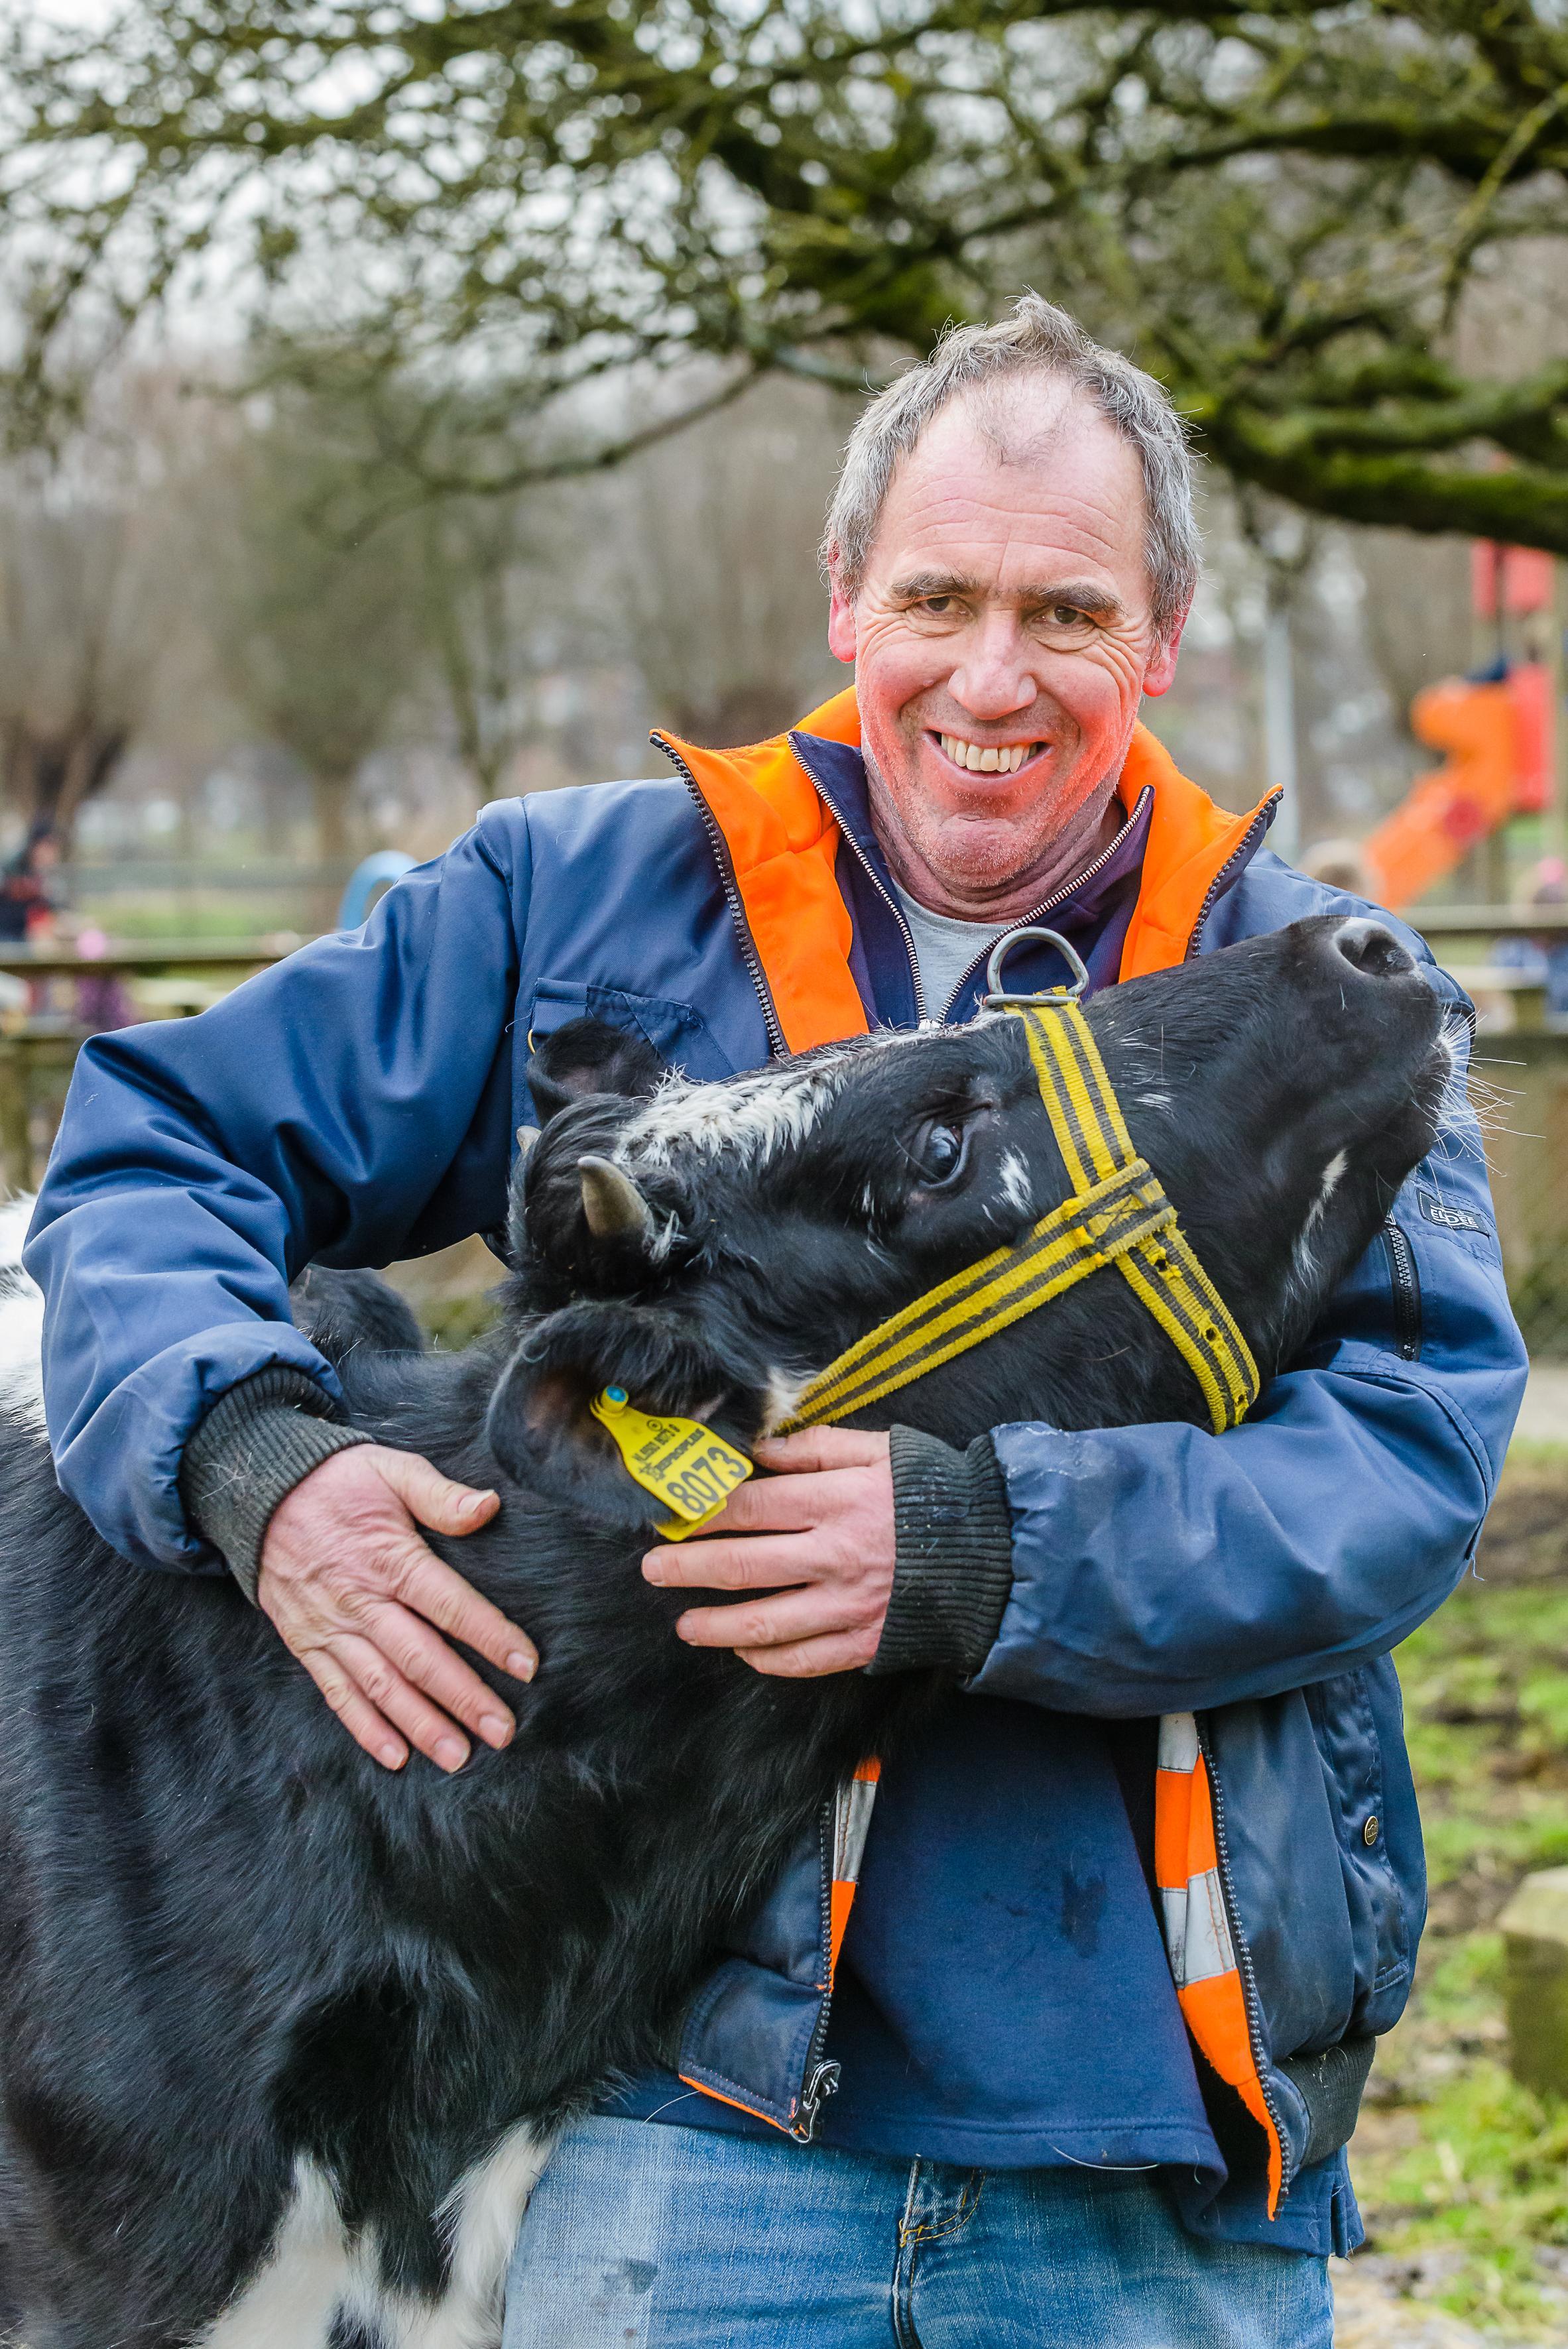 Jan Renes van stadsboerderij Darwinpark: Een dier oordeelt niet